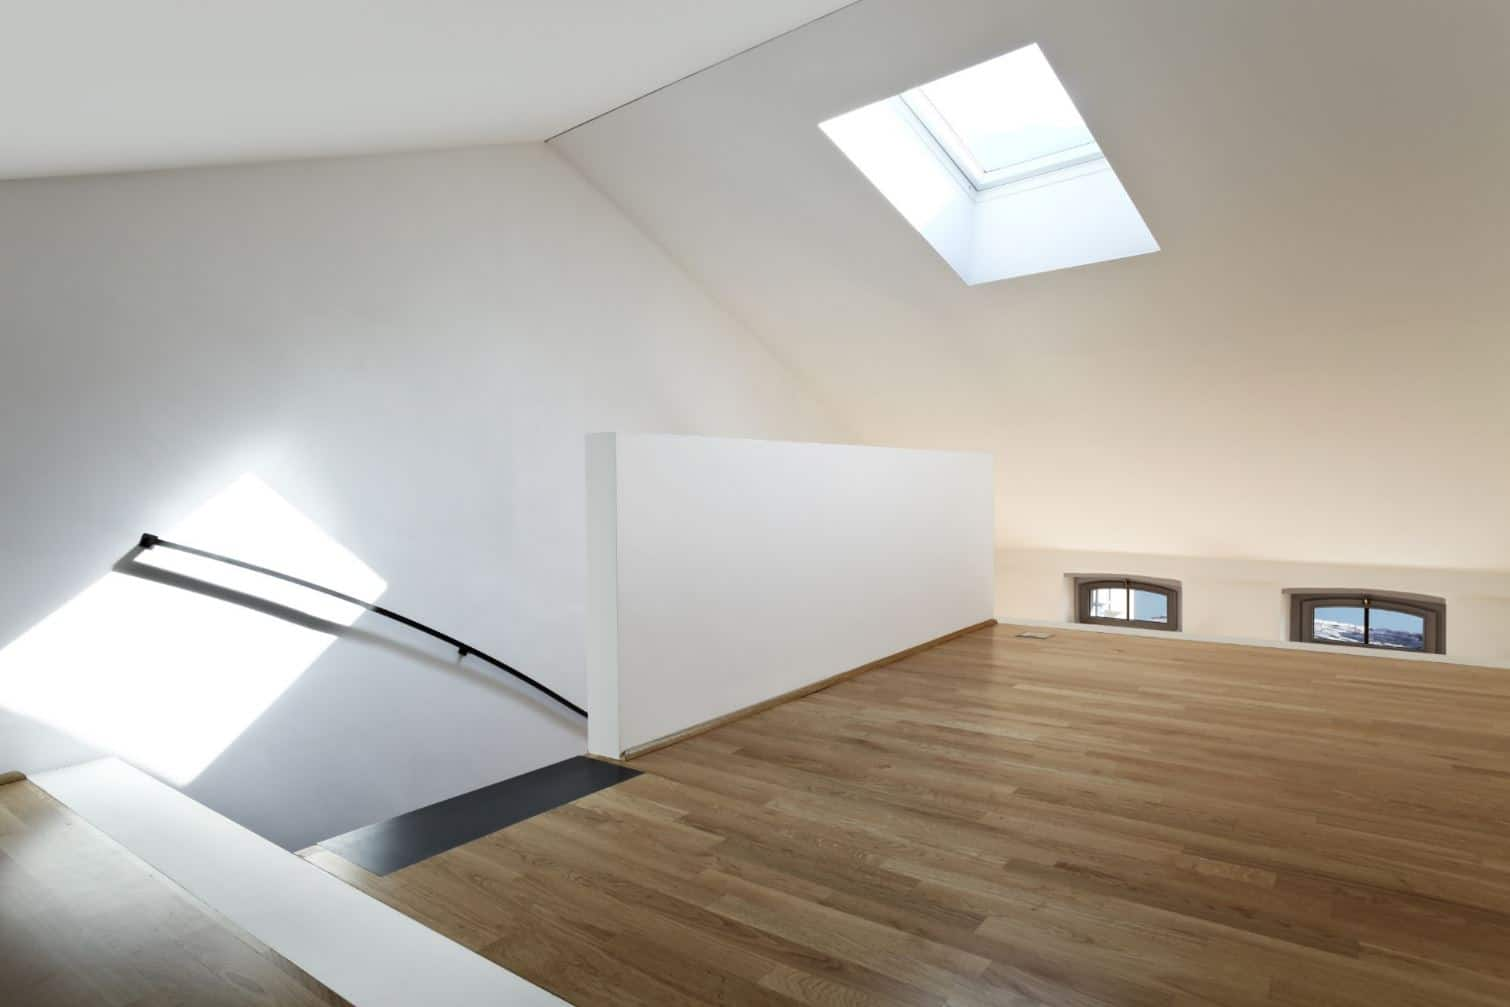 stunning amenager comble images home ideas 2018. Black Bedroom Furniture Sets. Home Design Ideas